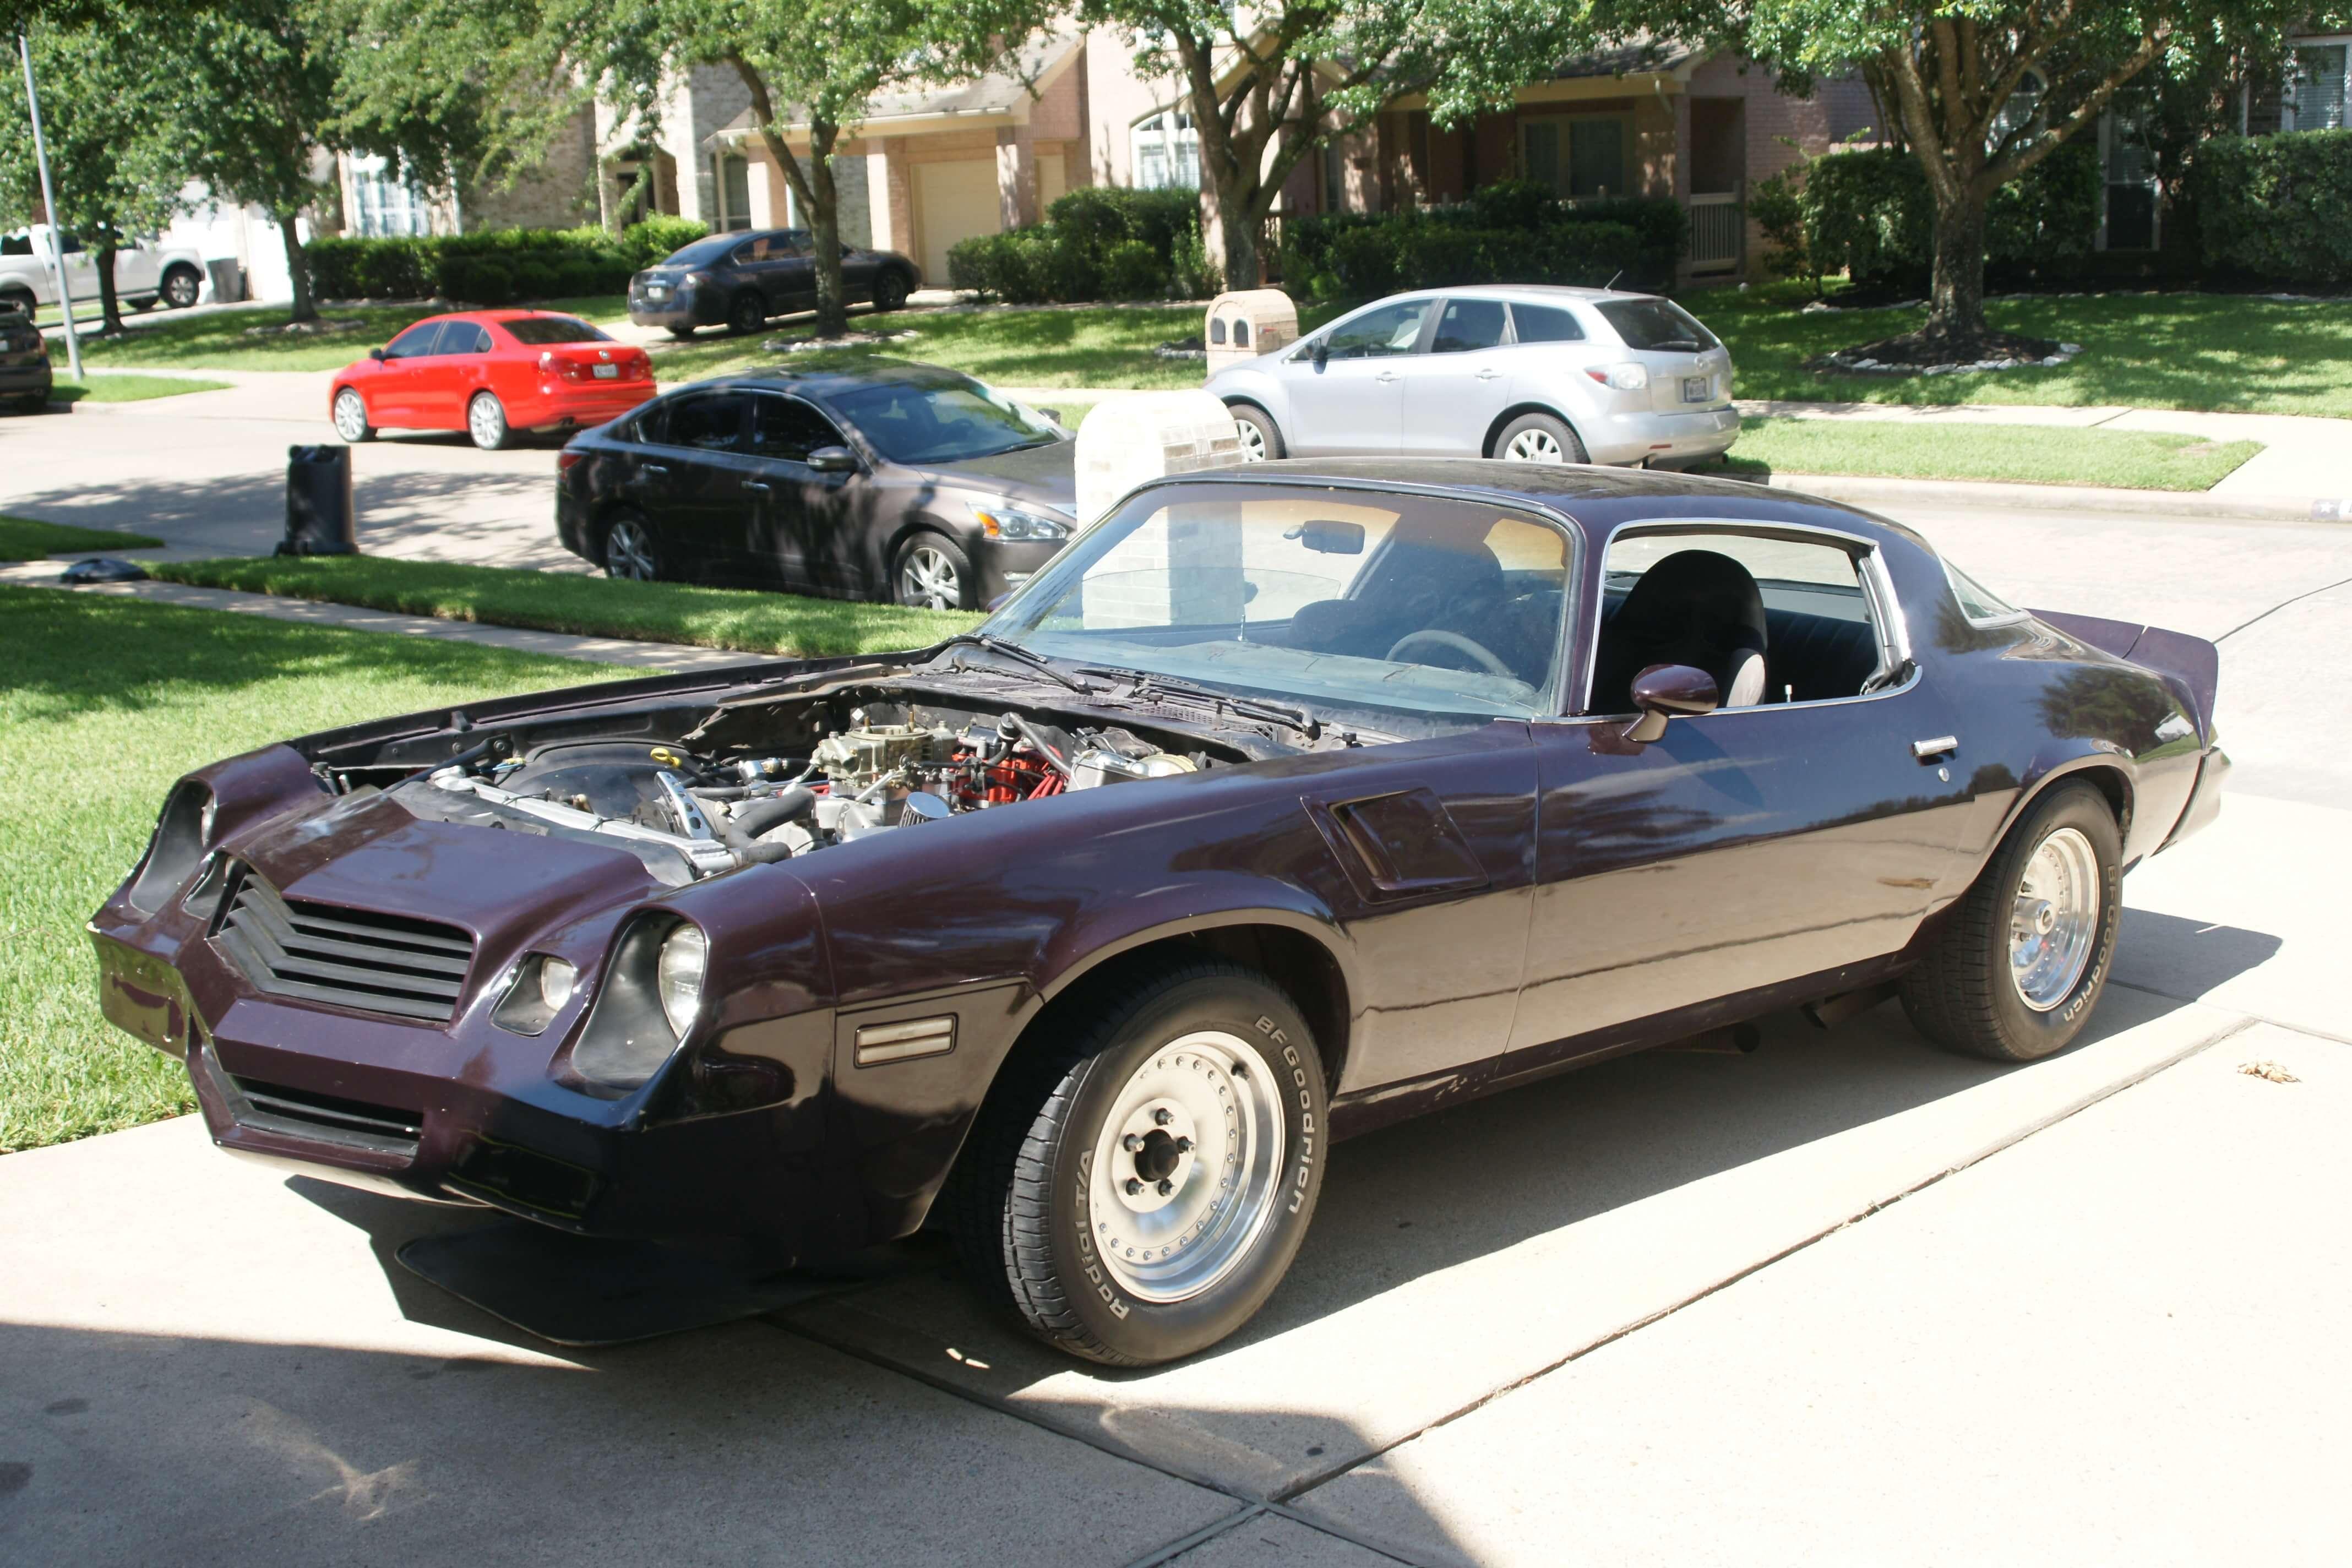 Max's 1980 Chevrolet Camaro - Holley My Garage